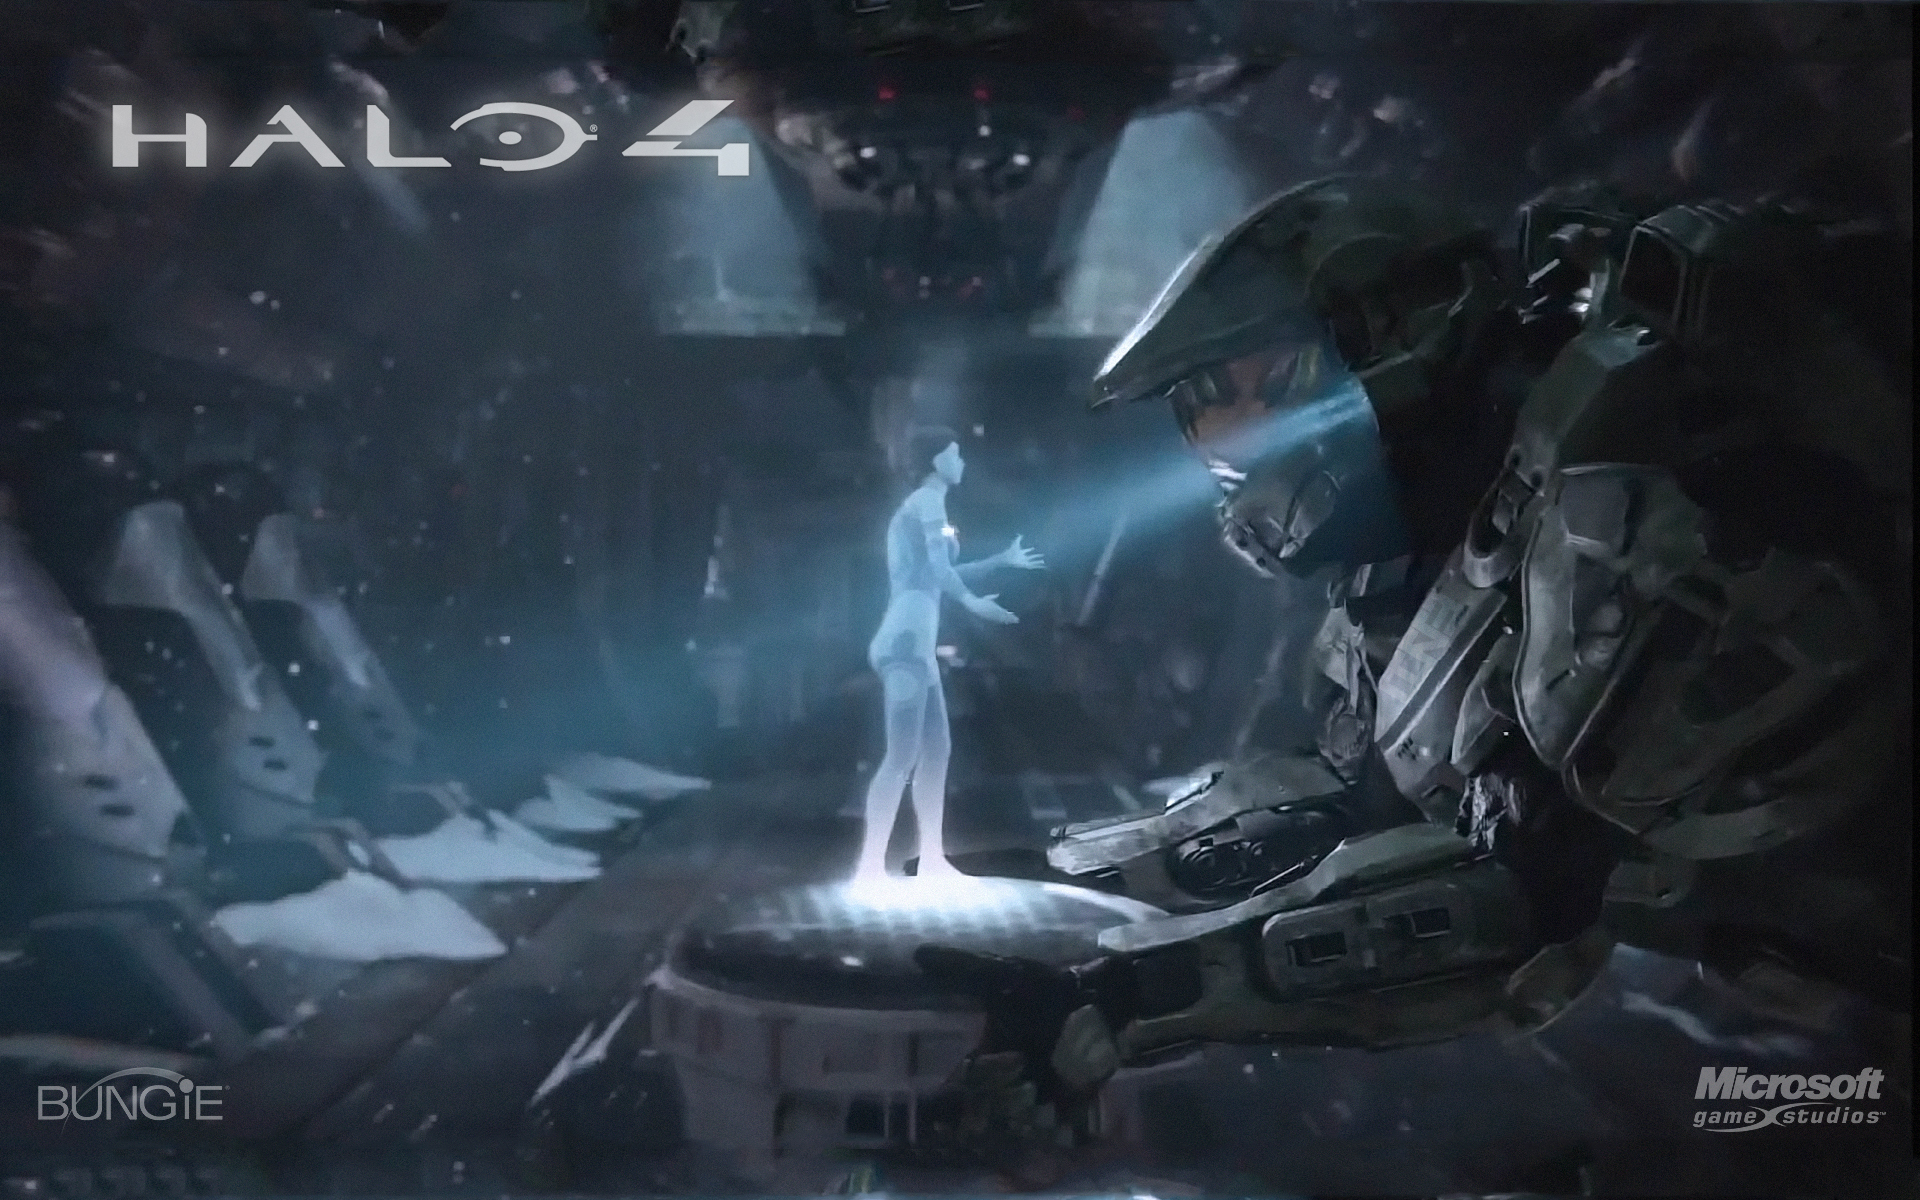 Download Halo 4 Wallpaper HD By Ockre 2979 Full Size 1920x1200